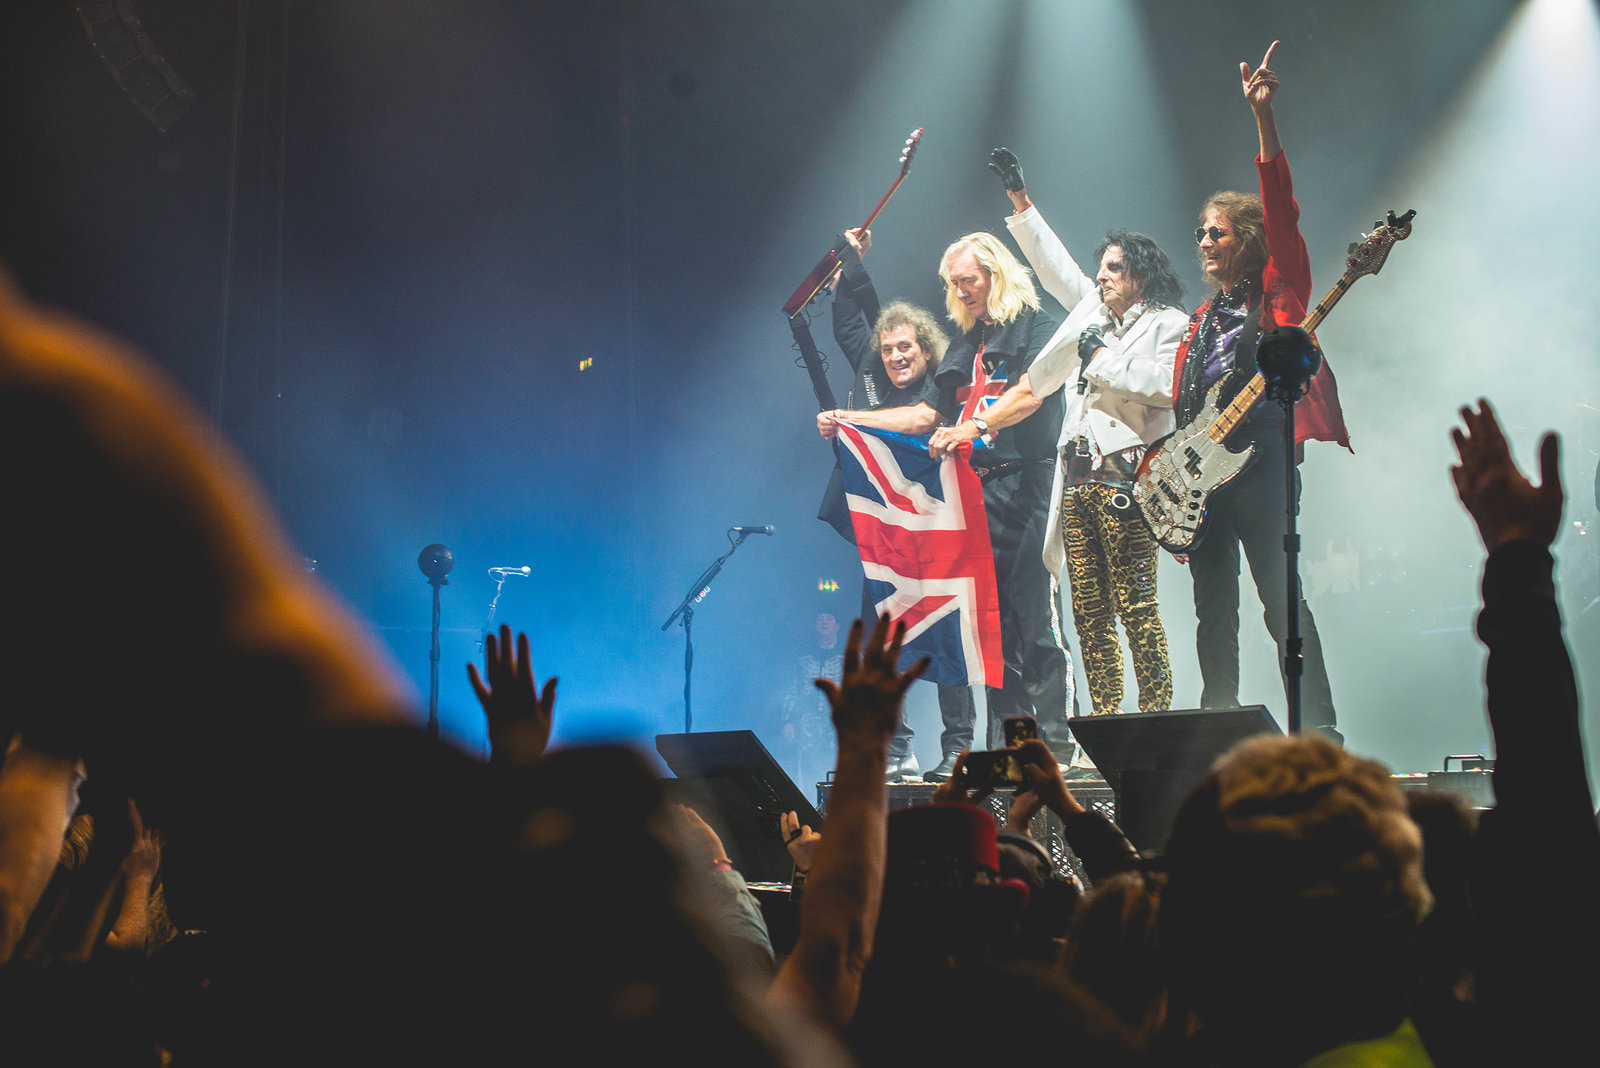 Alice Cooper at the SSE Wembley Arena in November 2017